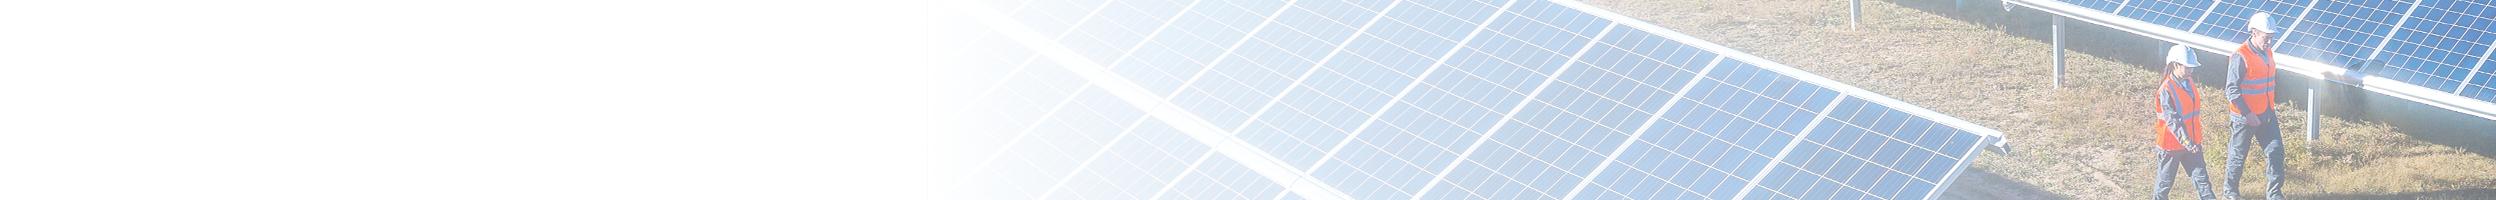 Striving for Solar Panel Dependence